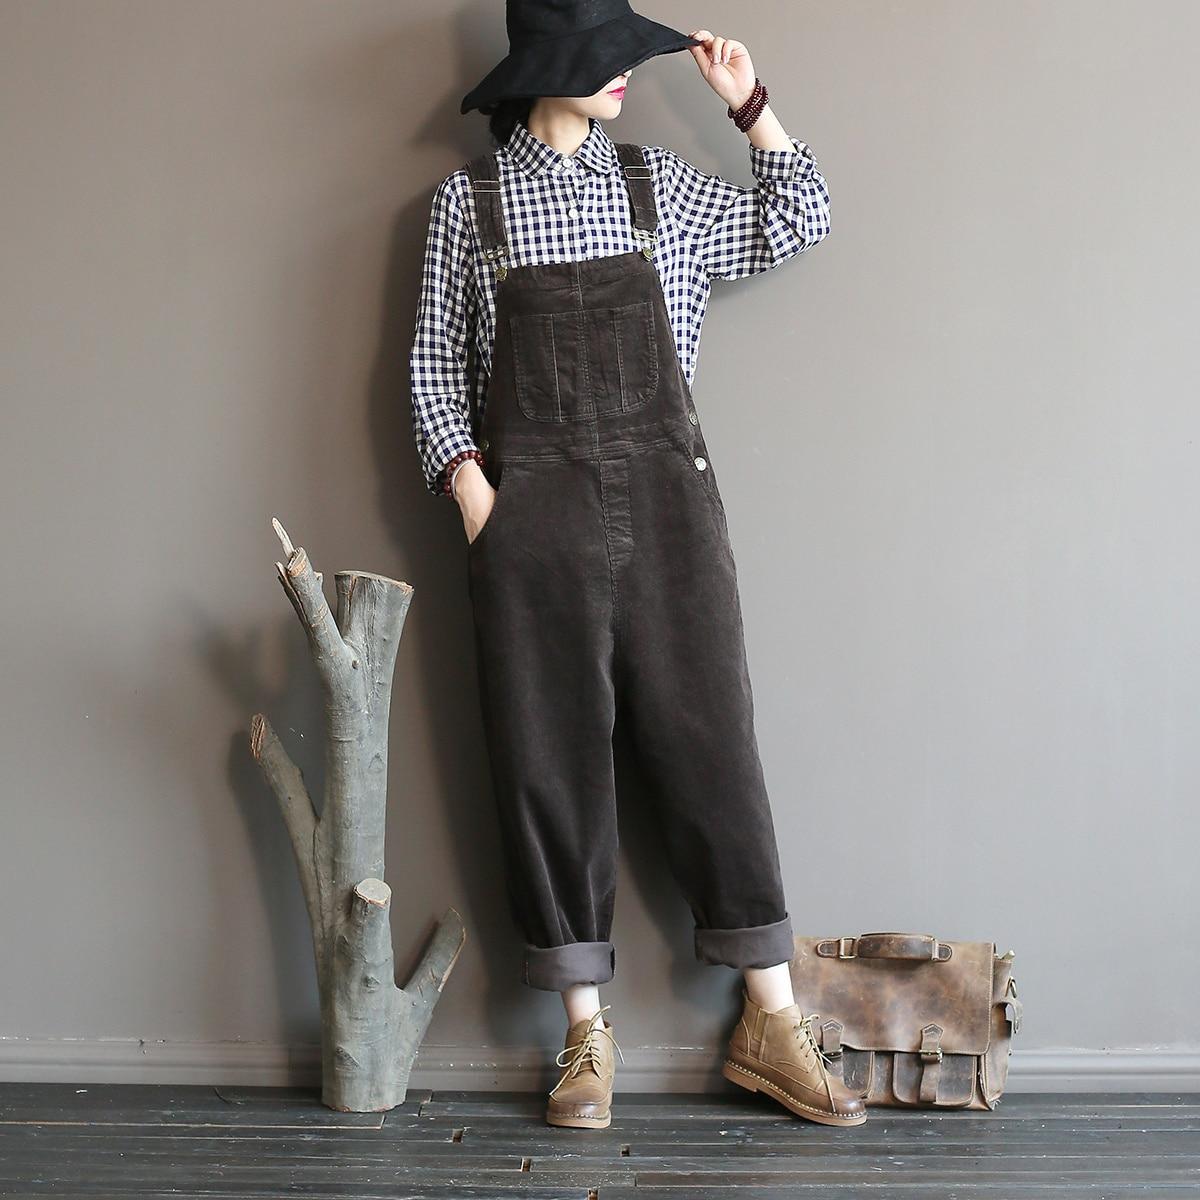 Johnature 2018 Autumn Winter New Original   Jumpsuits   Cotton Corduroy Women Vintage Loose Strap Thick Warm Pocket Casual   Jumpsuits